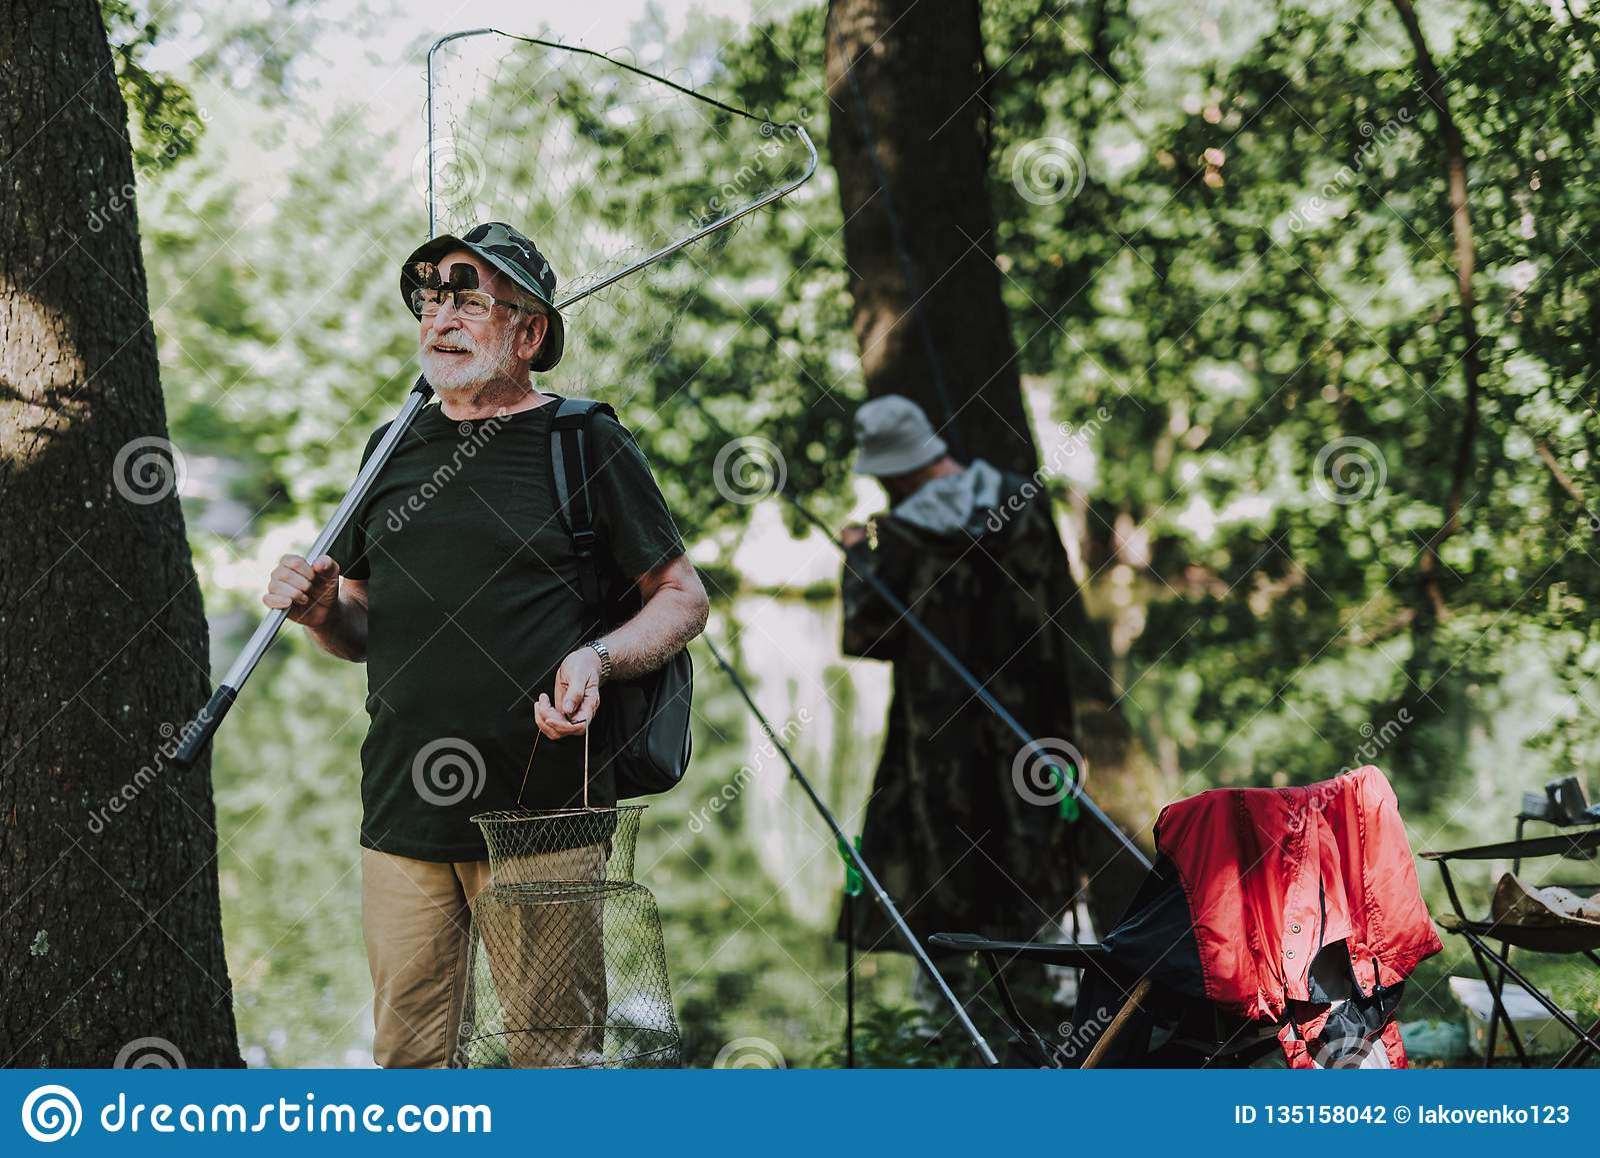 Pescador de sexo masculino positivo que sostiene el equipo de pesca profesional